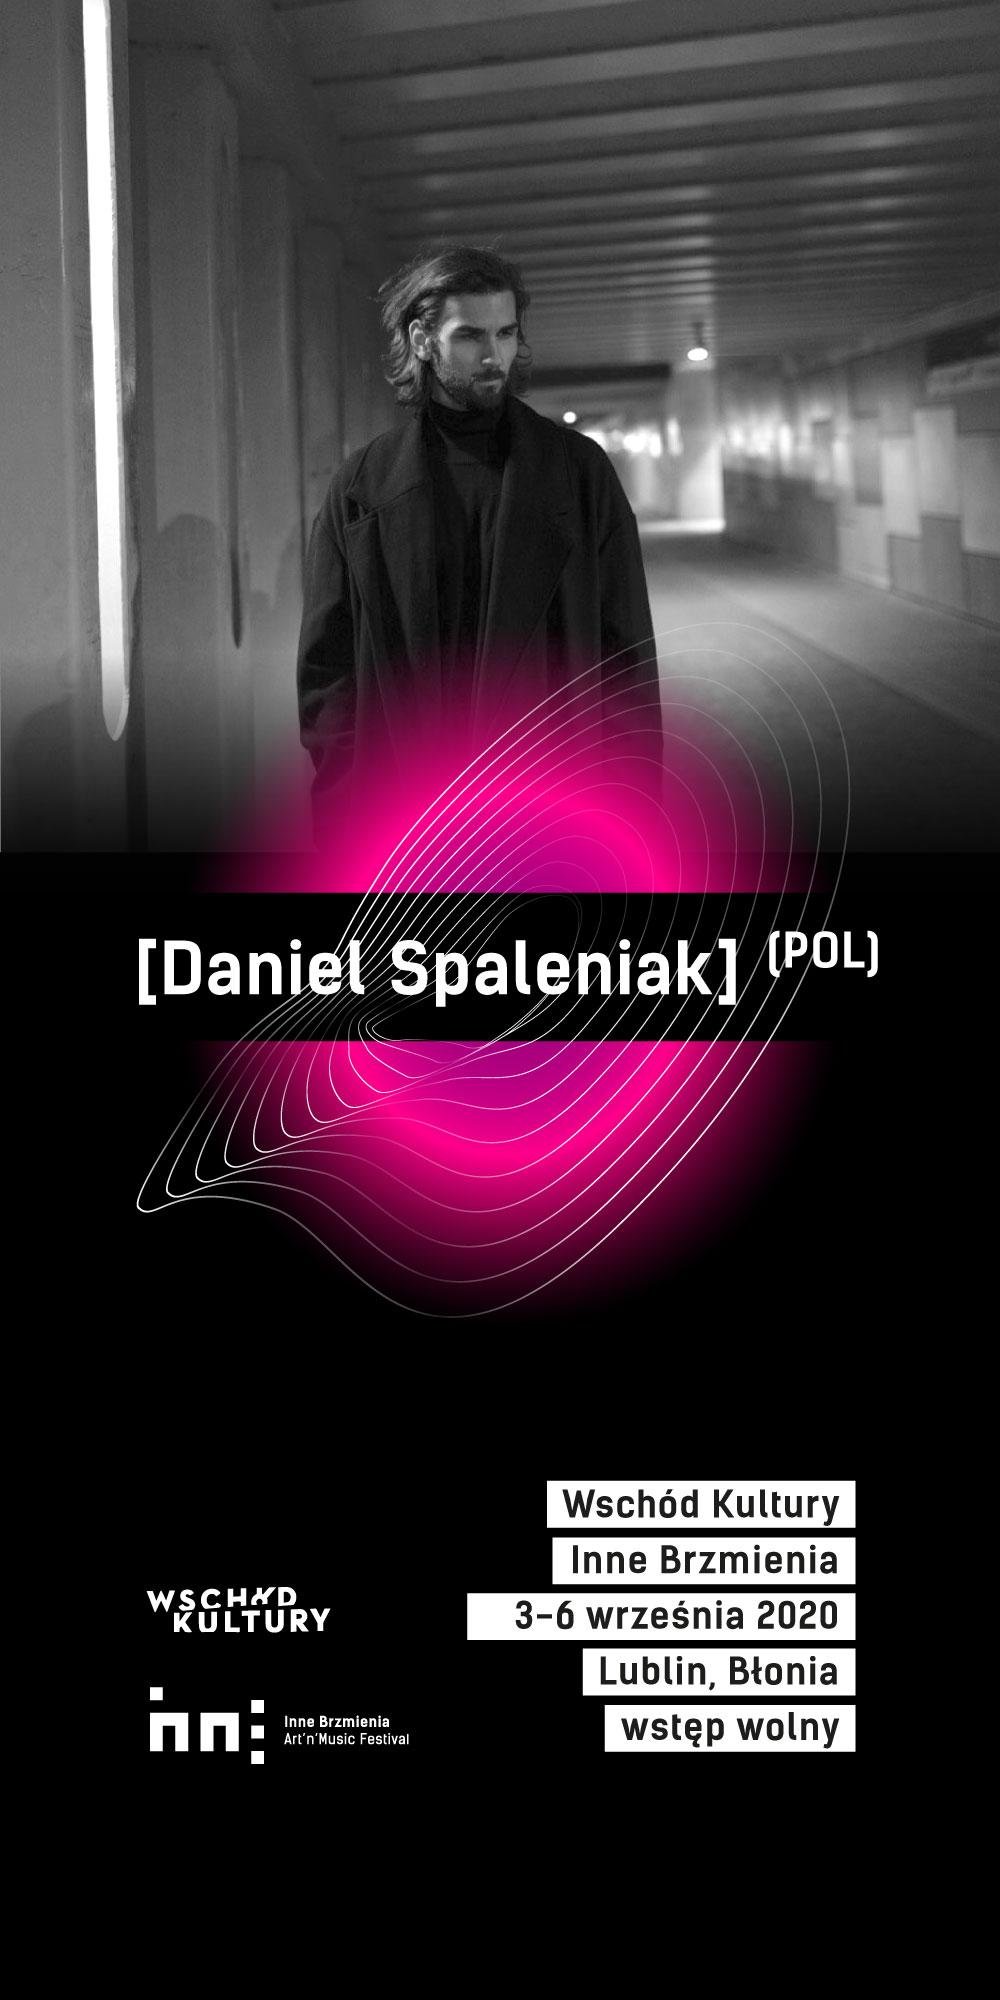 plakat Daniel Spaleniak